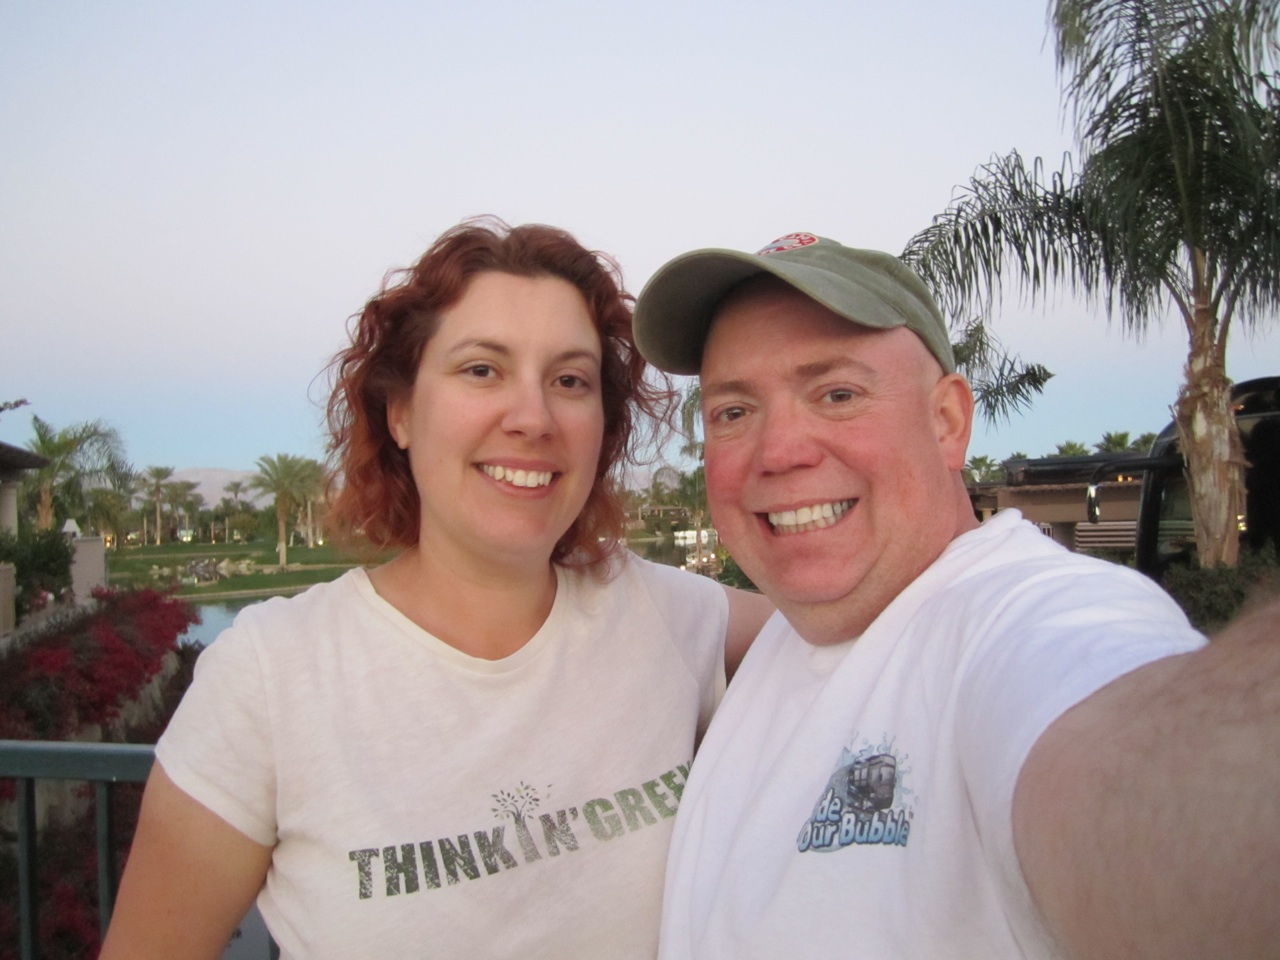 David & Brenda On An Evening Walk In The Resort